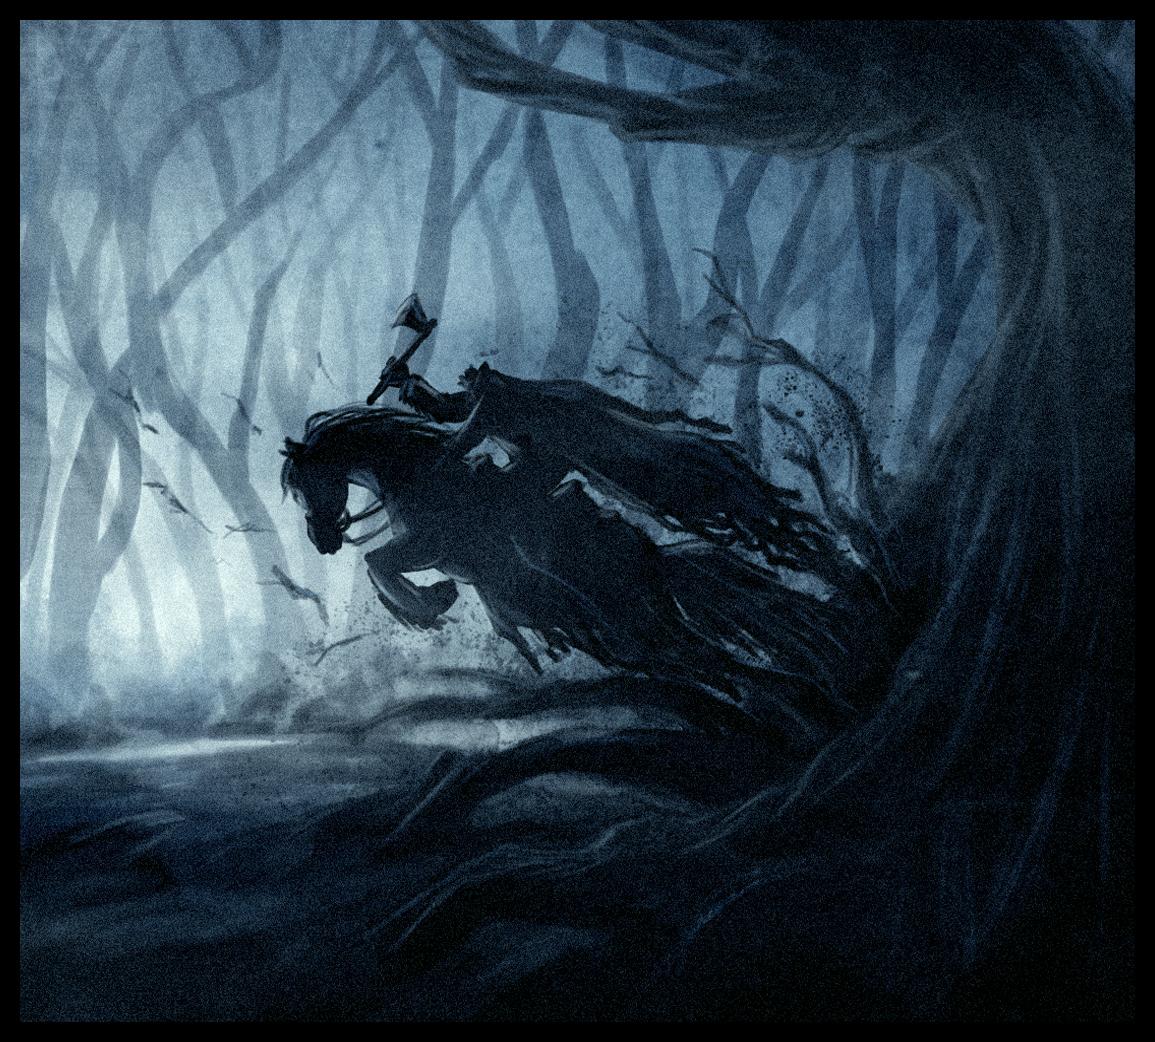 The Misadventures Of The Halloweenut The Hessian Rider: Headless Horseman By Mirchiz On DeviantArt